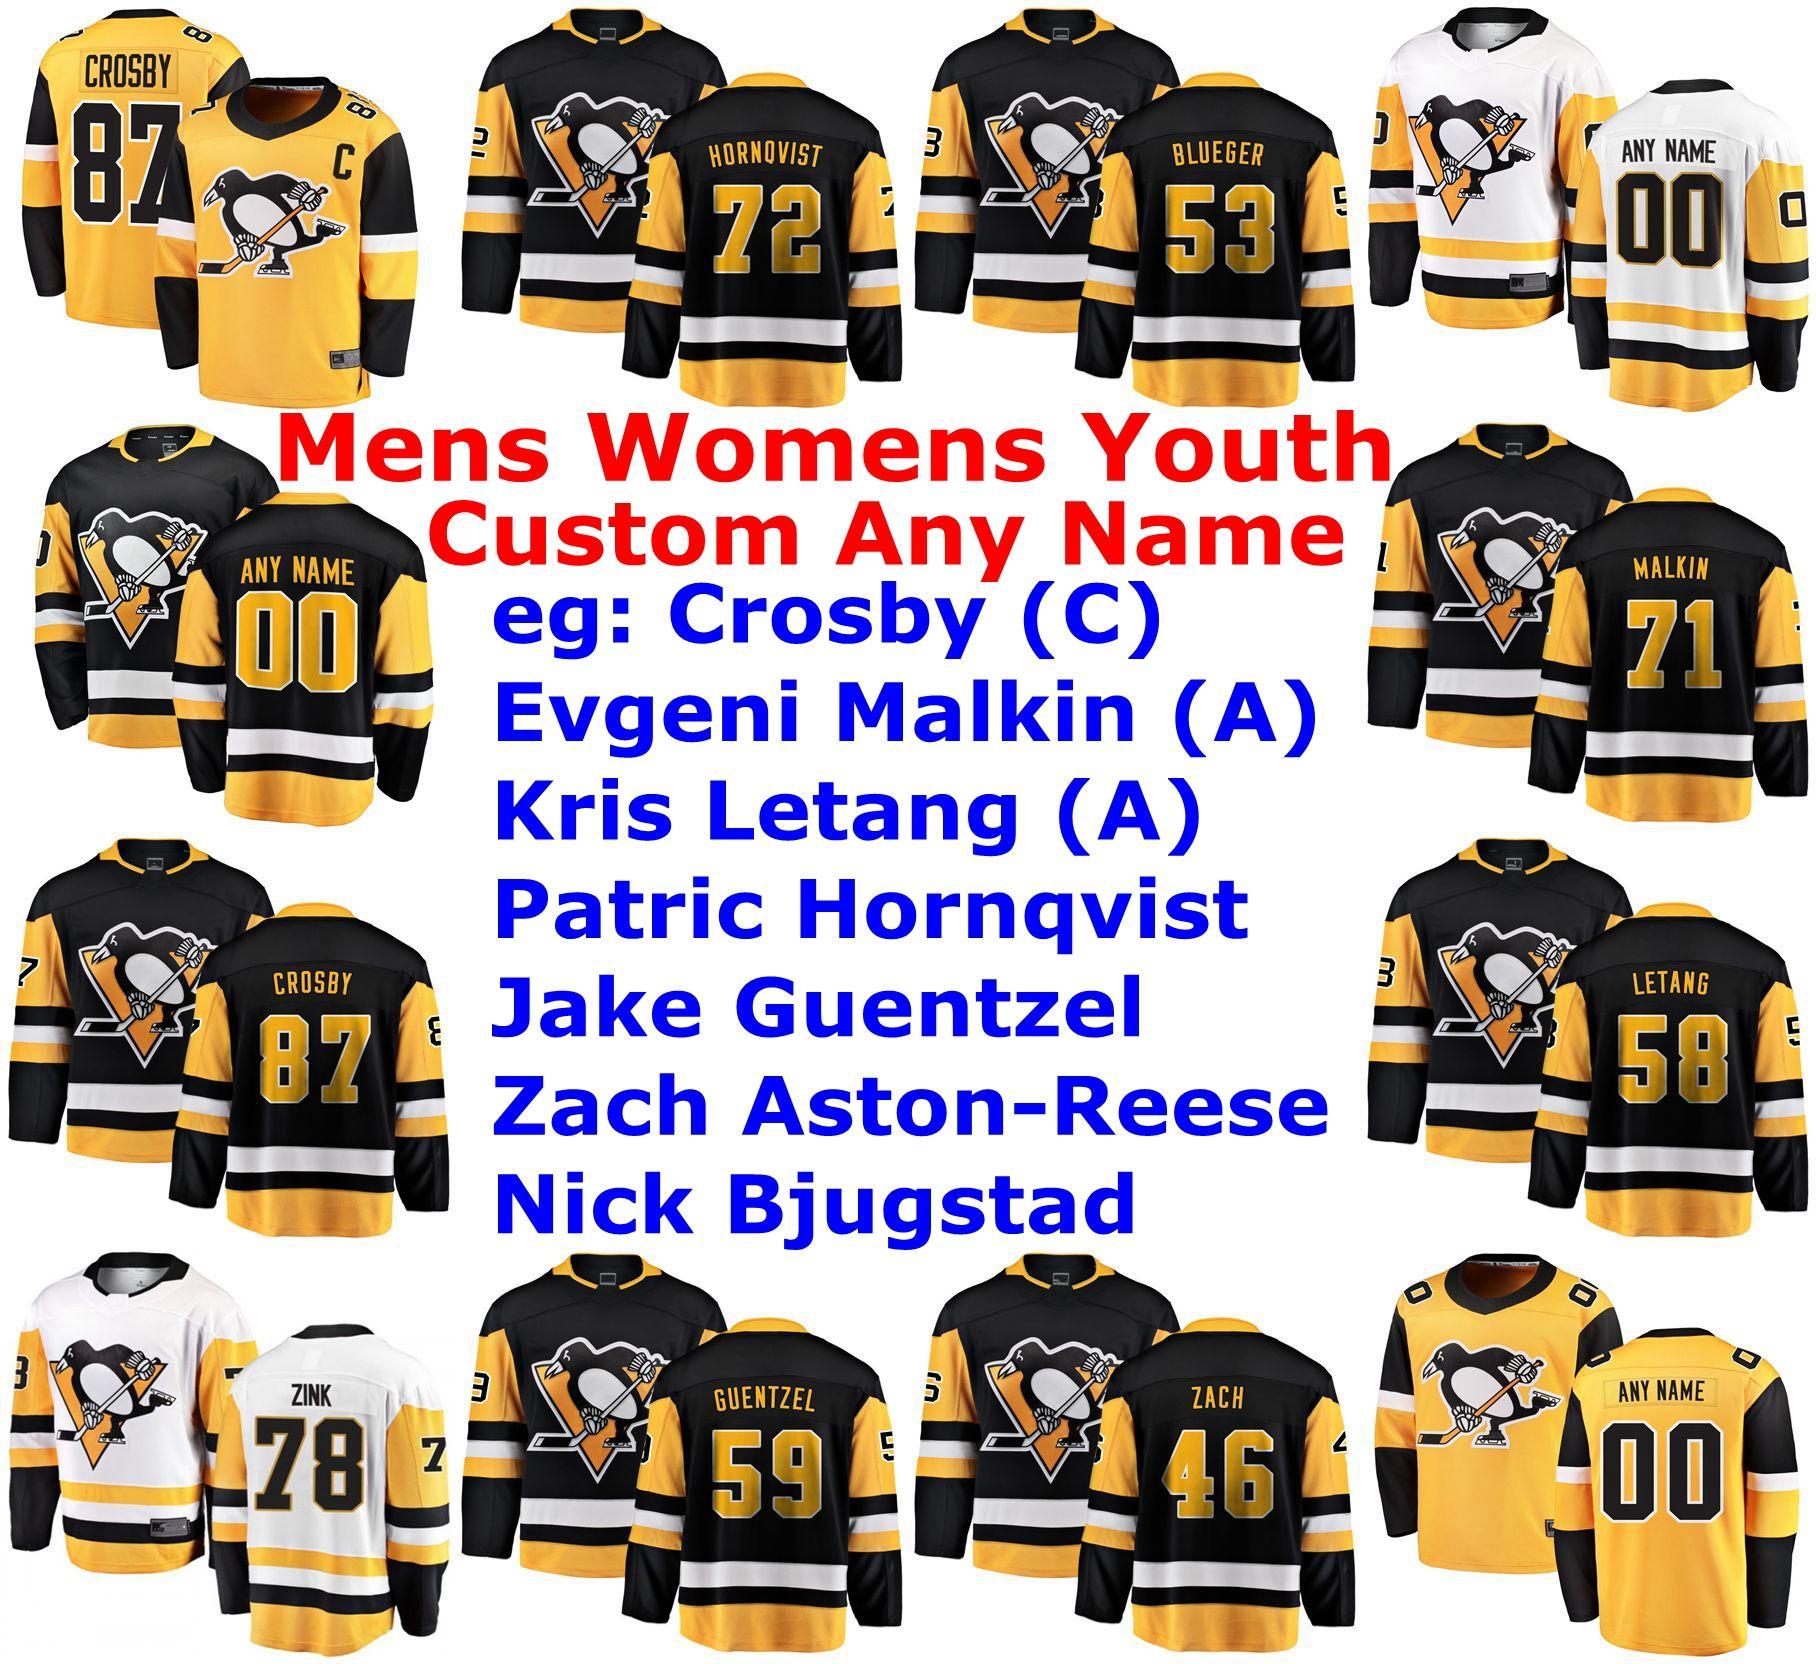 Pittsburgh Penguins Maillots Femmes Sidney Crosby Jersey Jake Guentzel Patric Hornqvist Letang Evgeni Malkin Hockey Maillots personnalisé Cousu